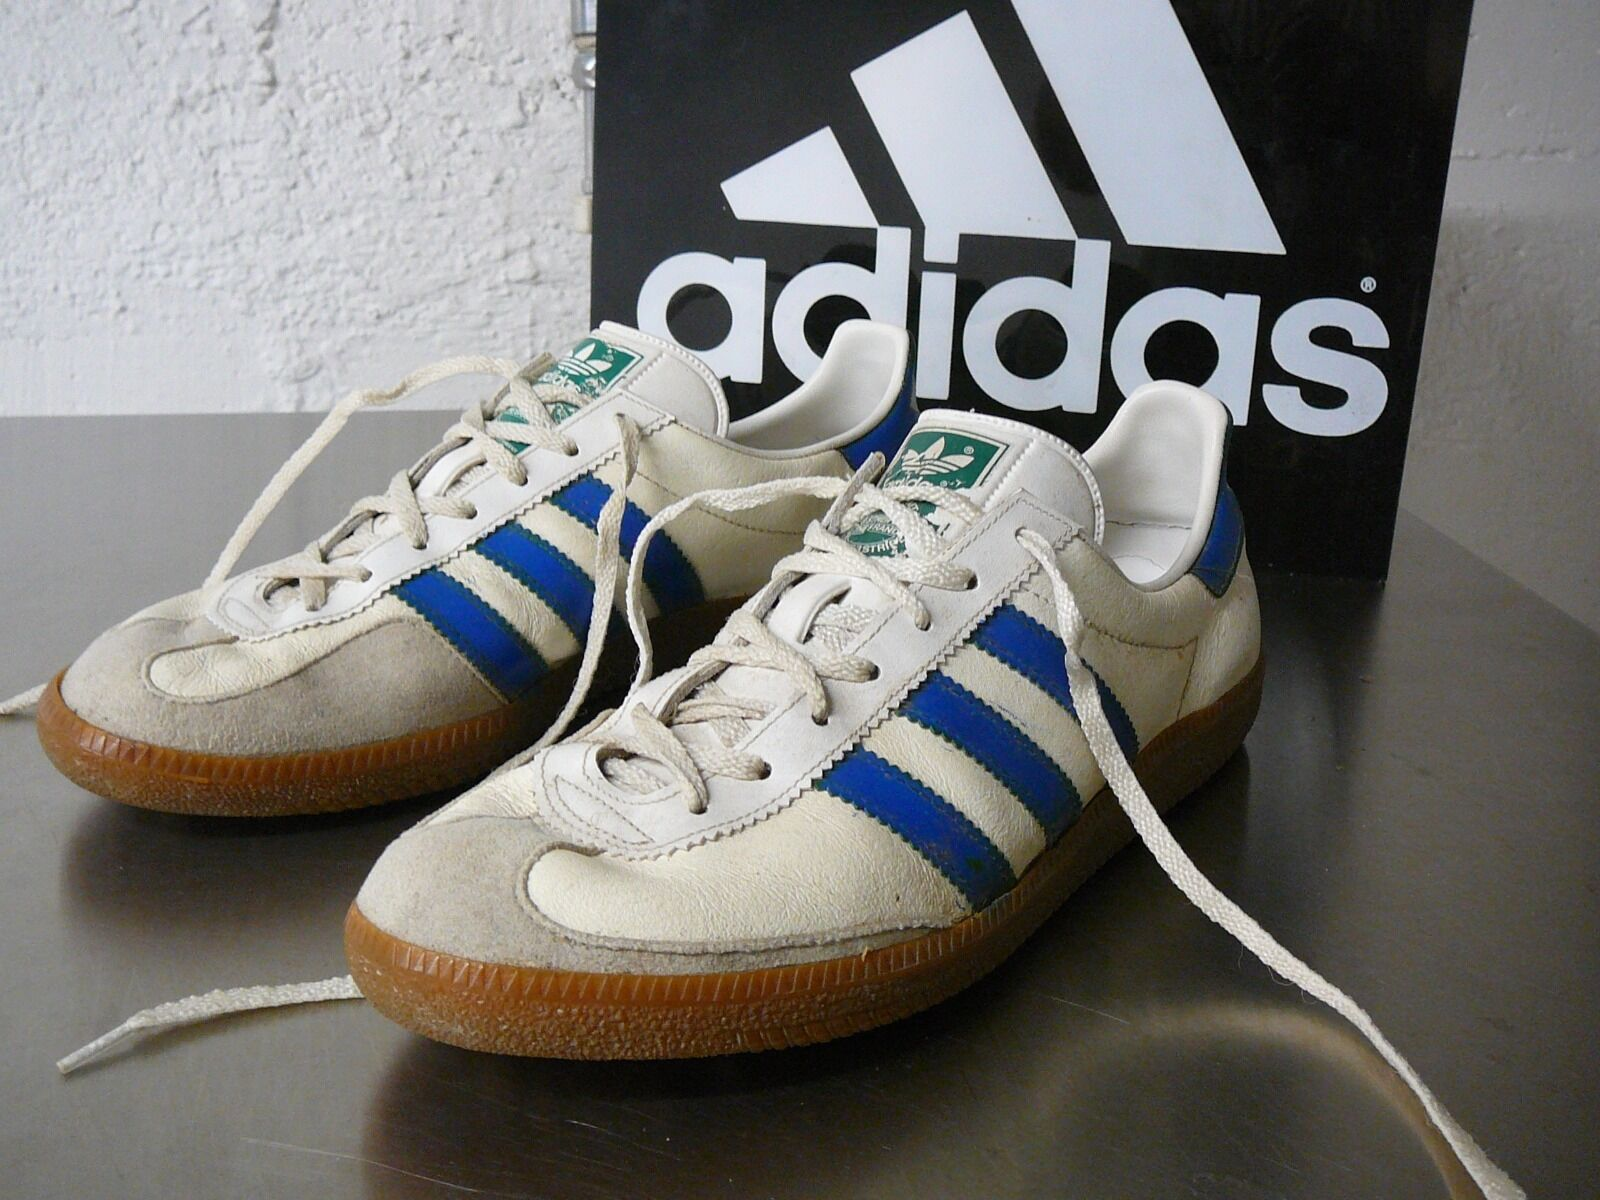 With 70iger Adidas Uk 8 5 Universal Spezial Weiß CshdQrt